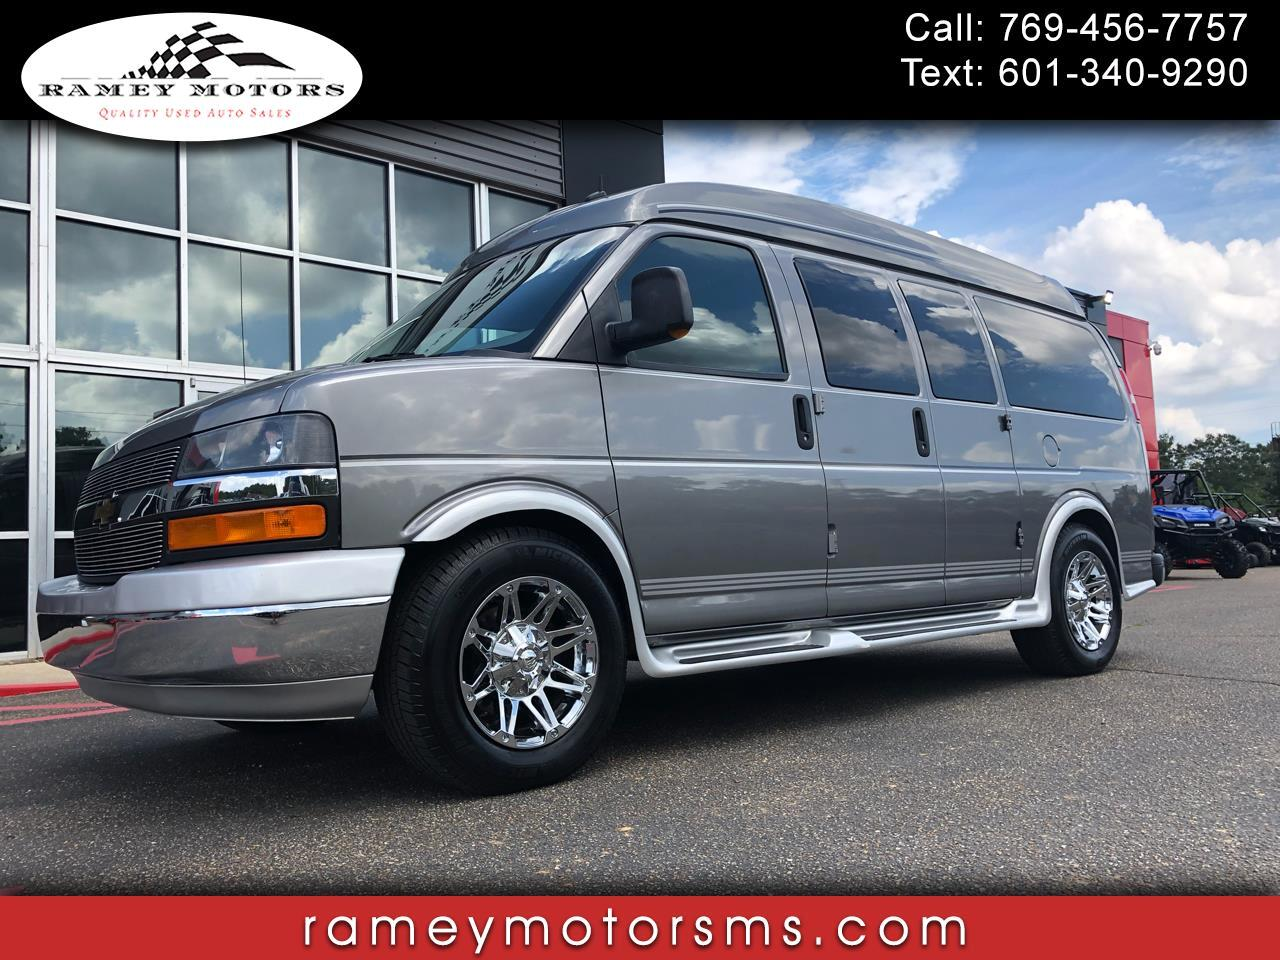 2011 Chevrolet Express HANDICAP VAN AMERICAN LUXURY COACH EDITION